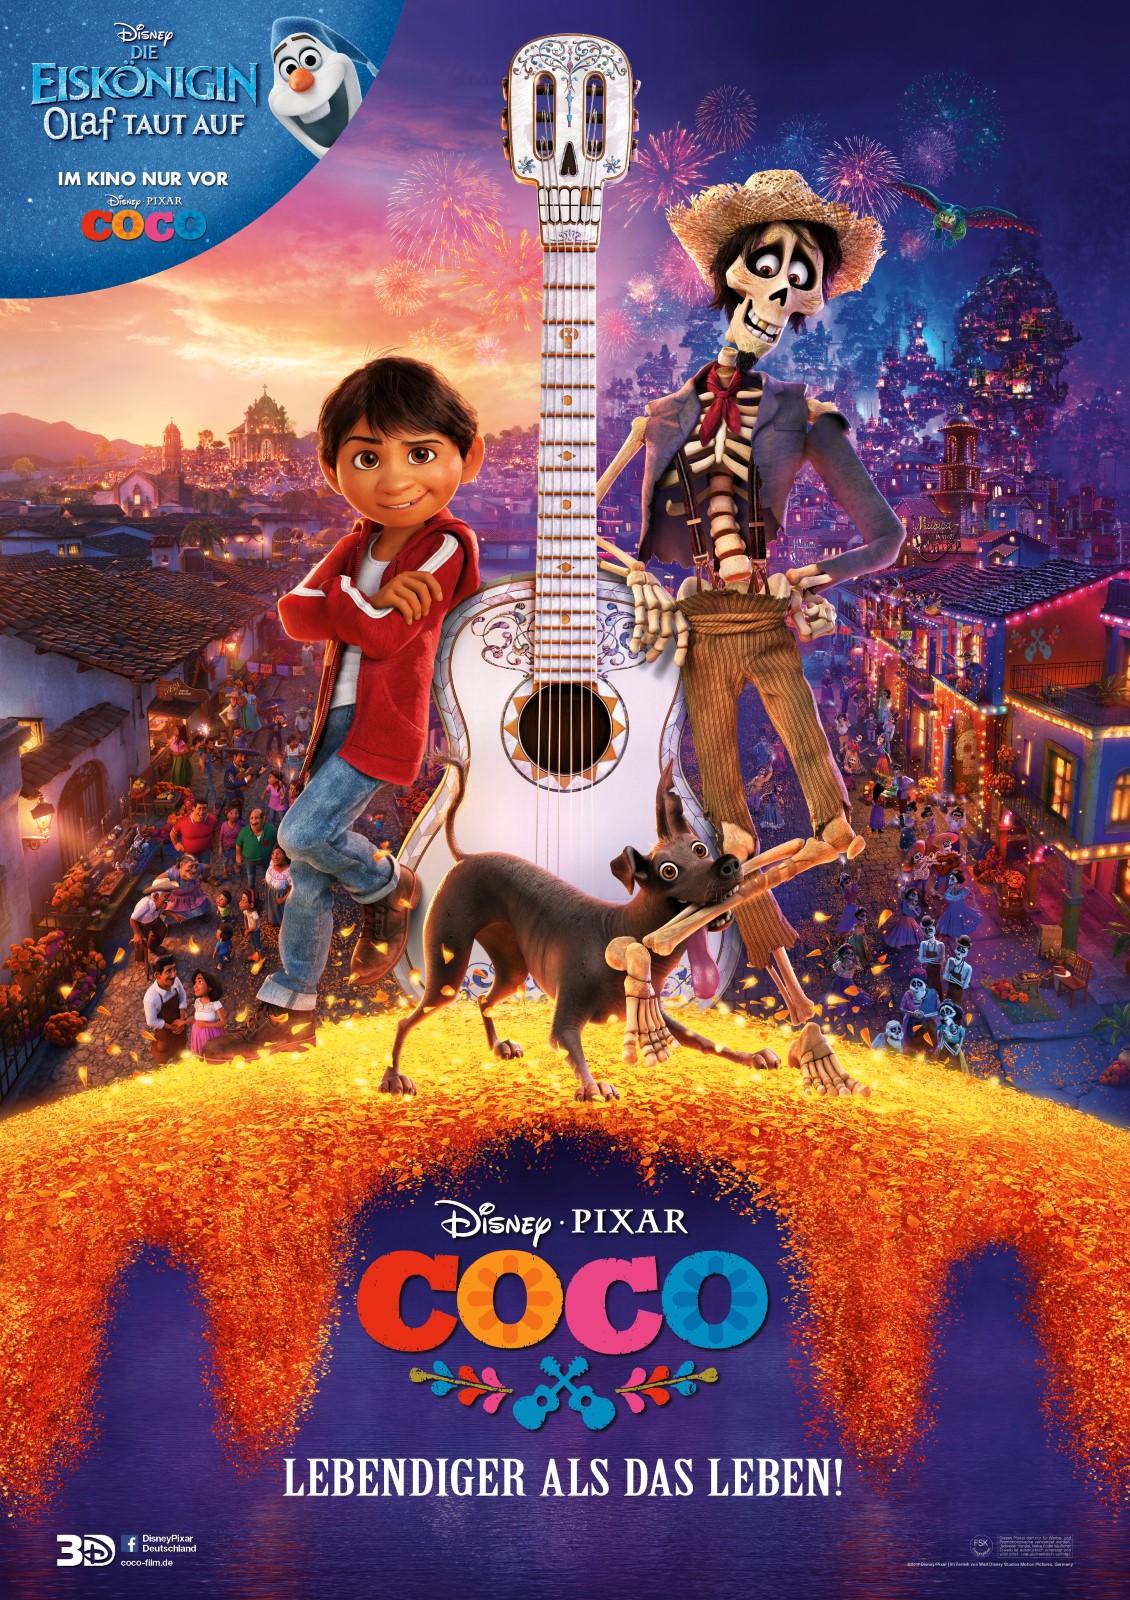 Coco - Lebendiger als das Leben! - Film 2017 - FILMSTARTS.de